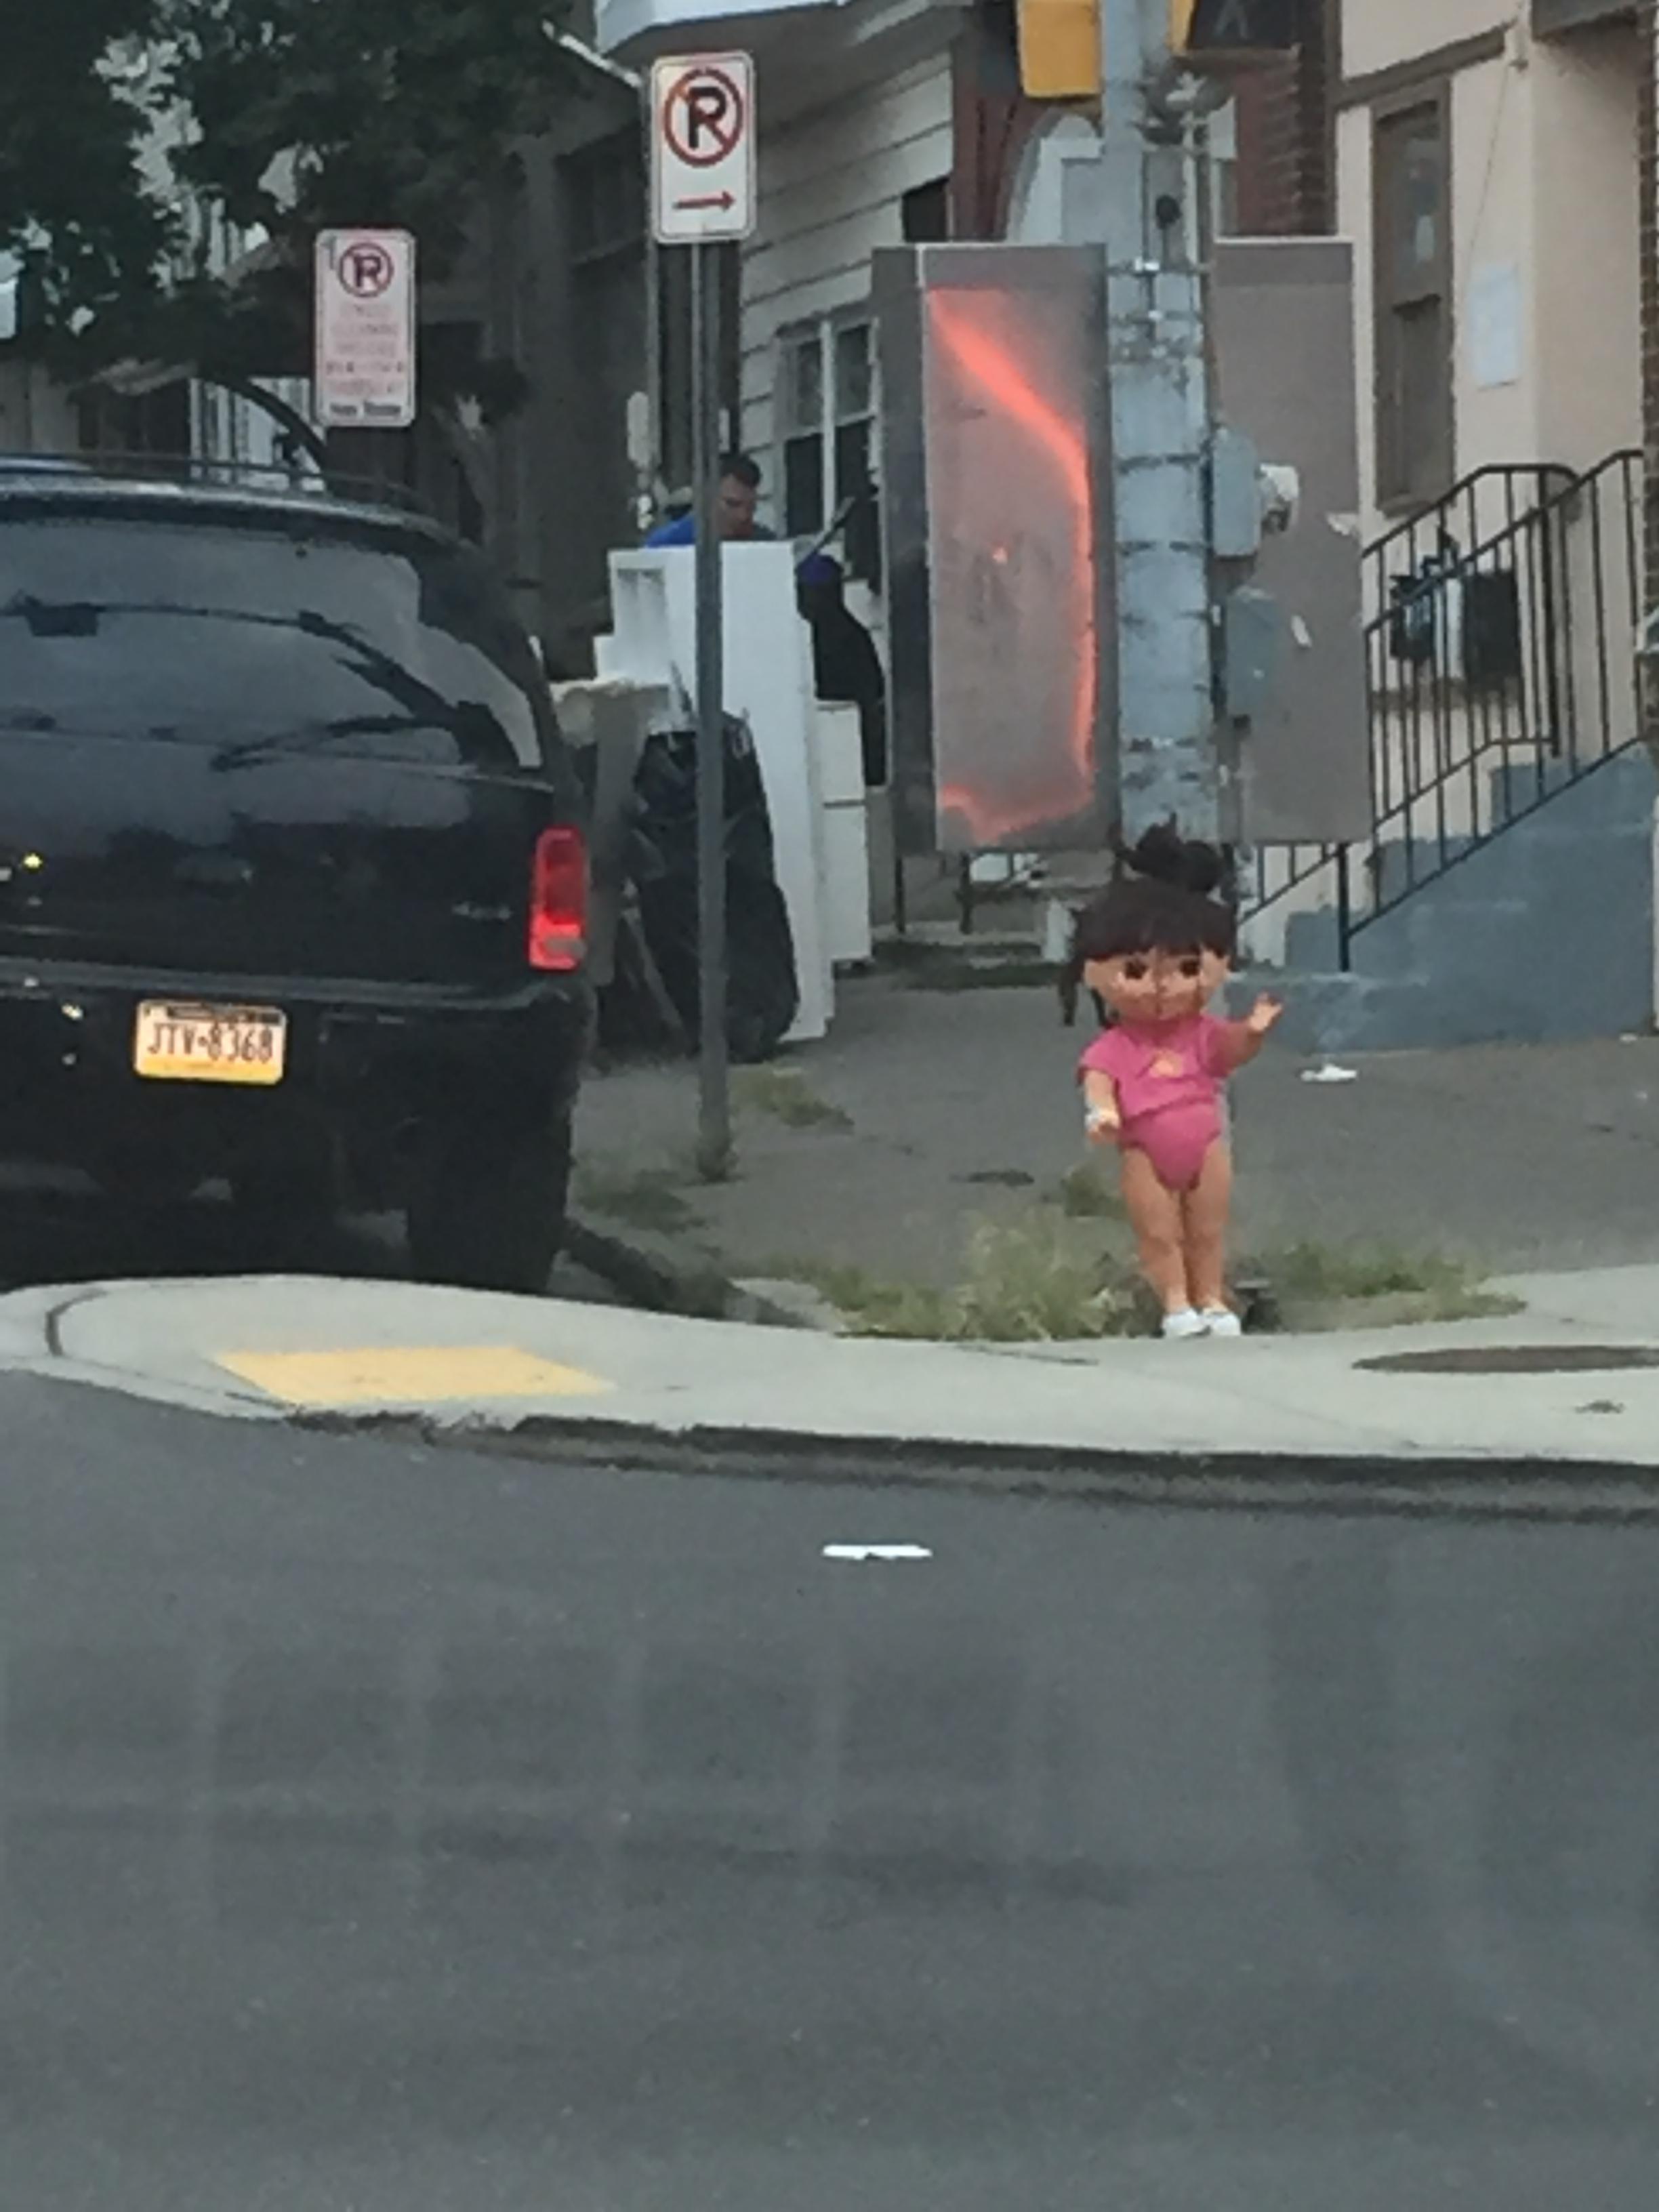 Dora and the sex